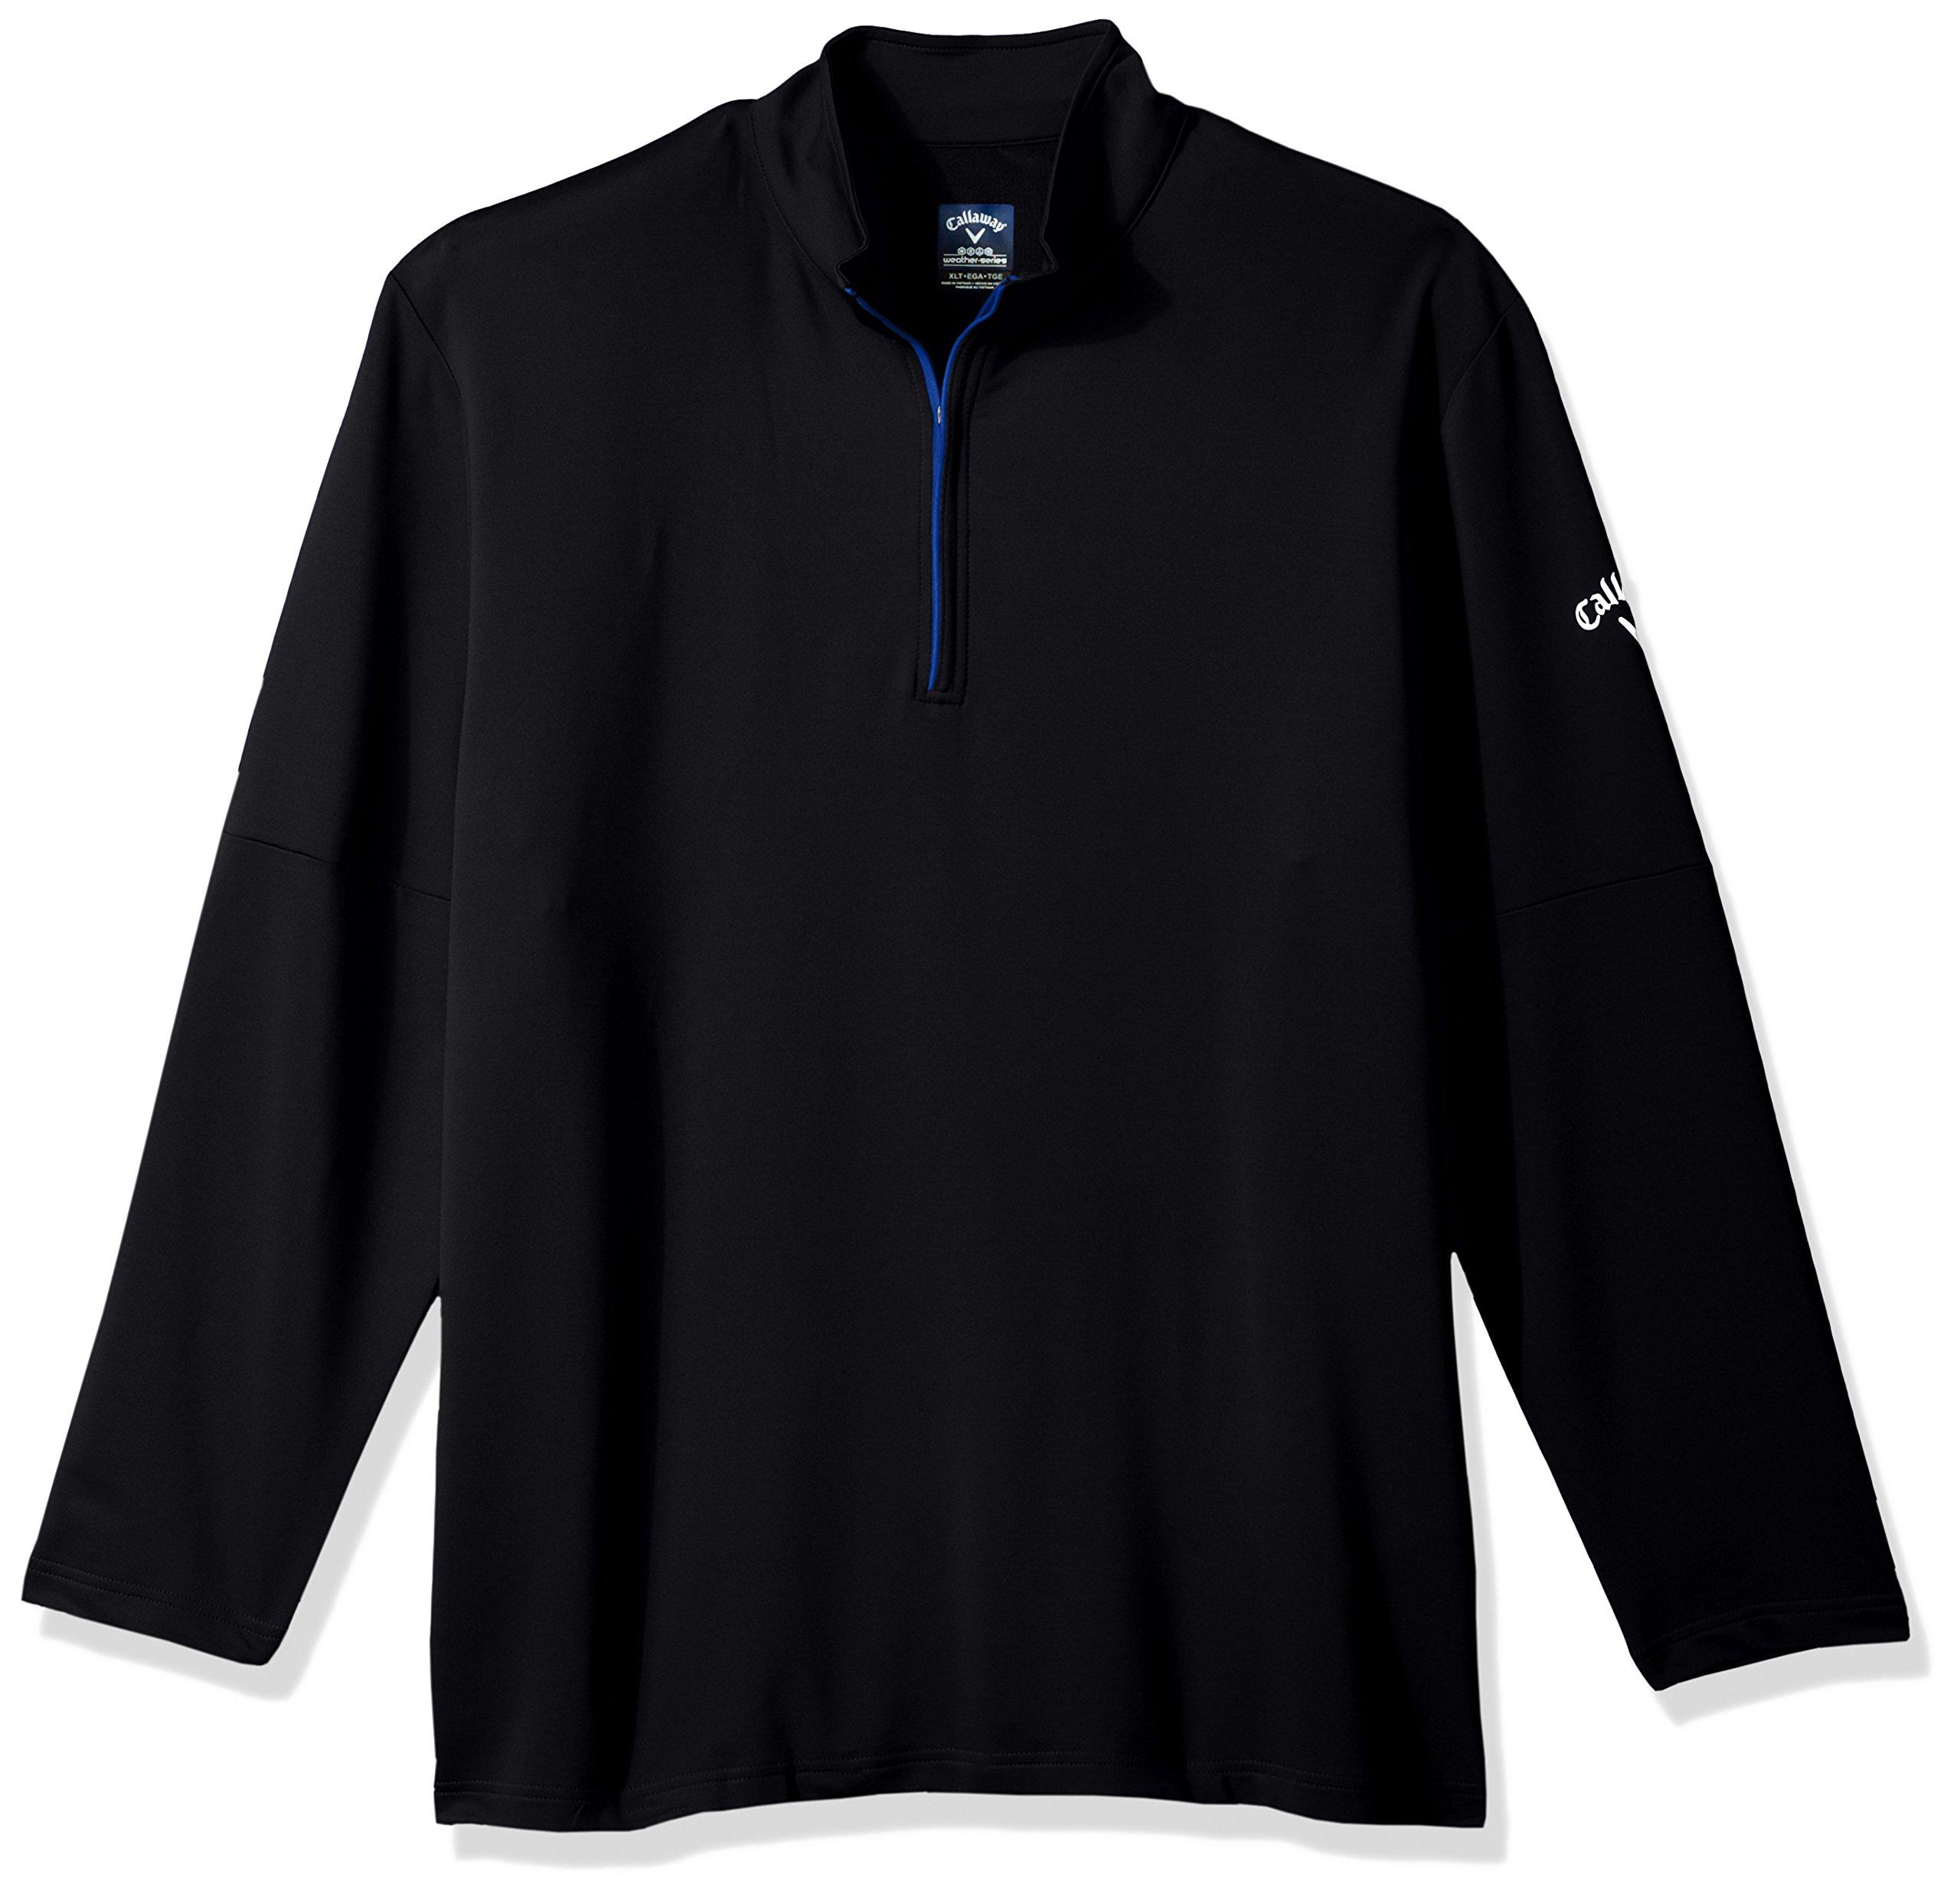 Callaway Men's Big & Tall Opti-Temp Long Sleeve Outlast Premium 1/4 Zip Midlayer Jacket, 5X, Caviar